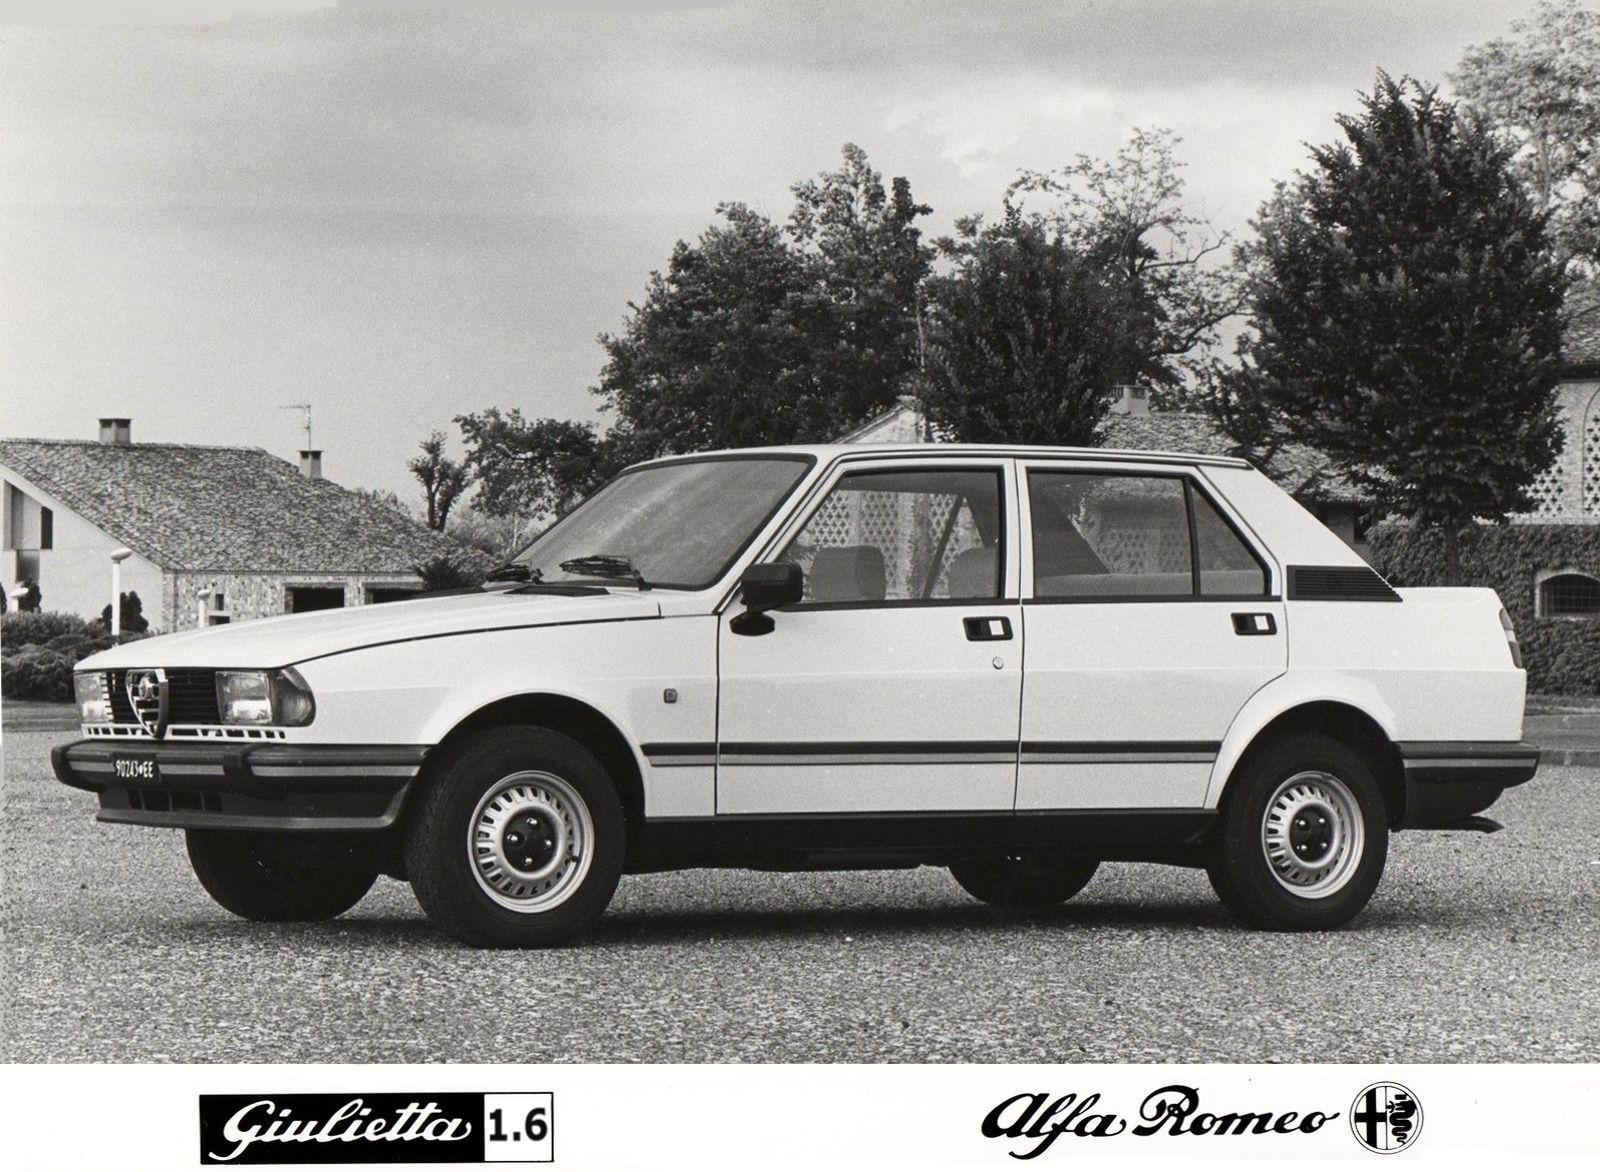 1981 Alfa Romeo Giulietta 1.6 (116) Press Photograph